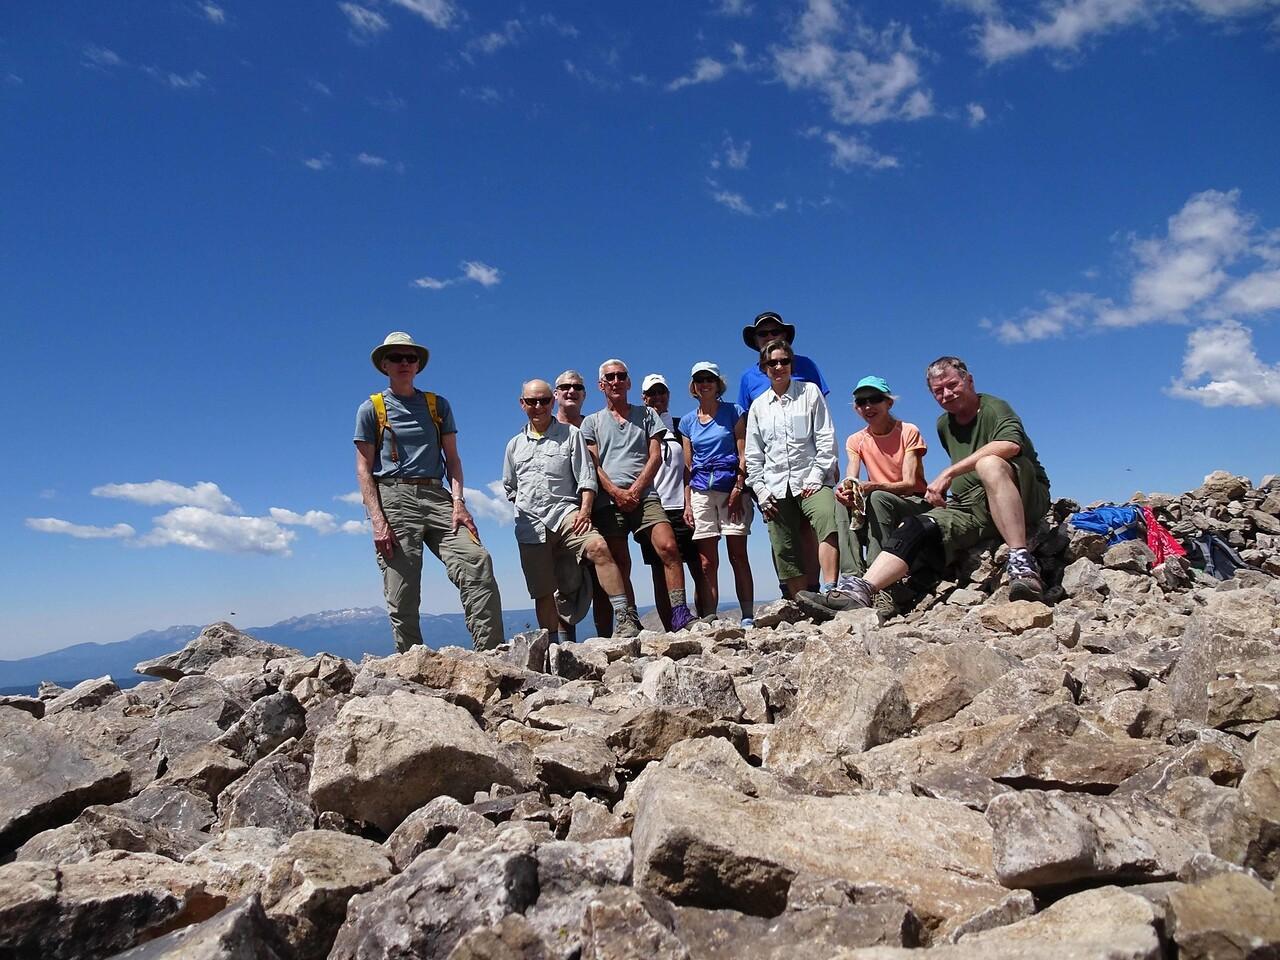 50 At the peak of Engineer Mtn, Charlie, Wayne, Keith, Bob, Robert, Sheri, Bill, Elaine, Lynn & Bruce